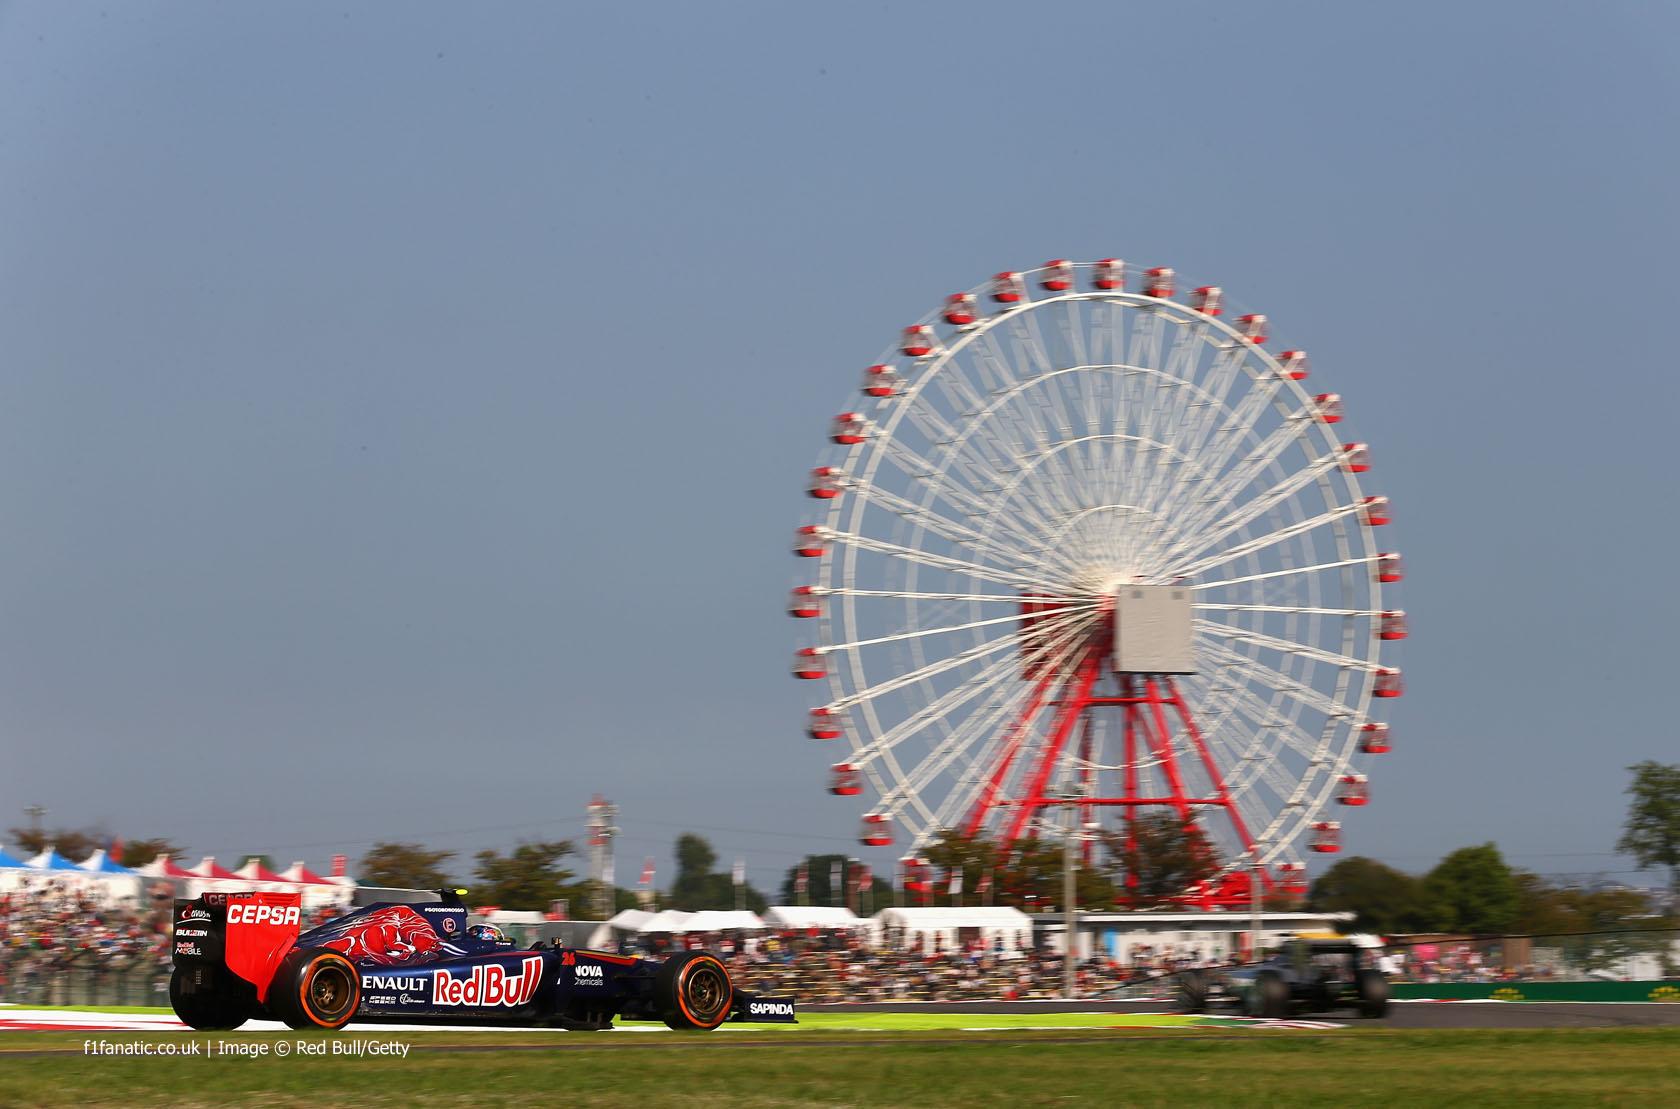 Daniil Kvyat, Toro Rosso, Suzuka, 2014